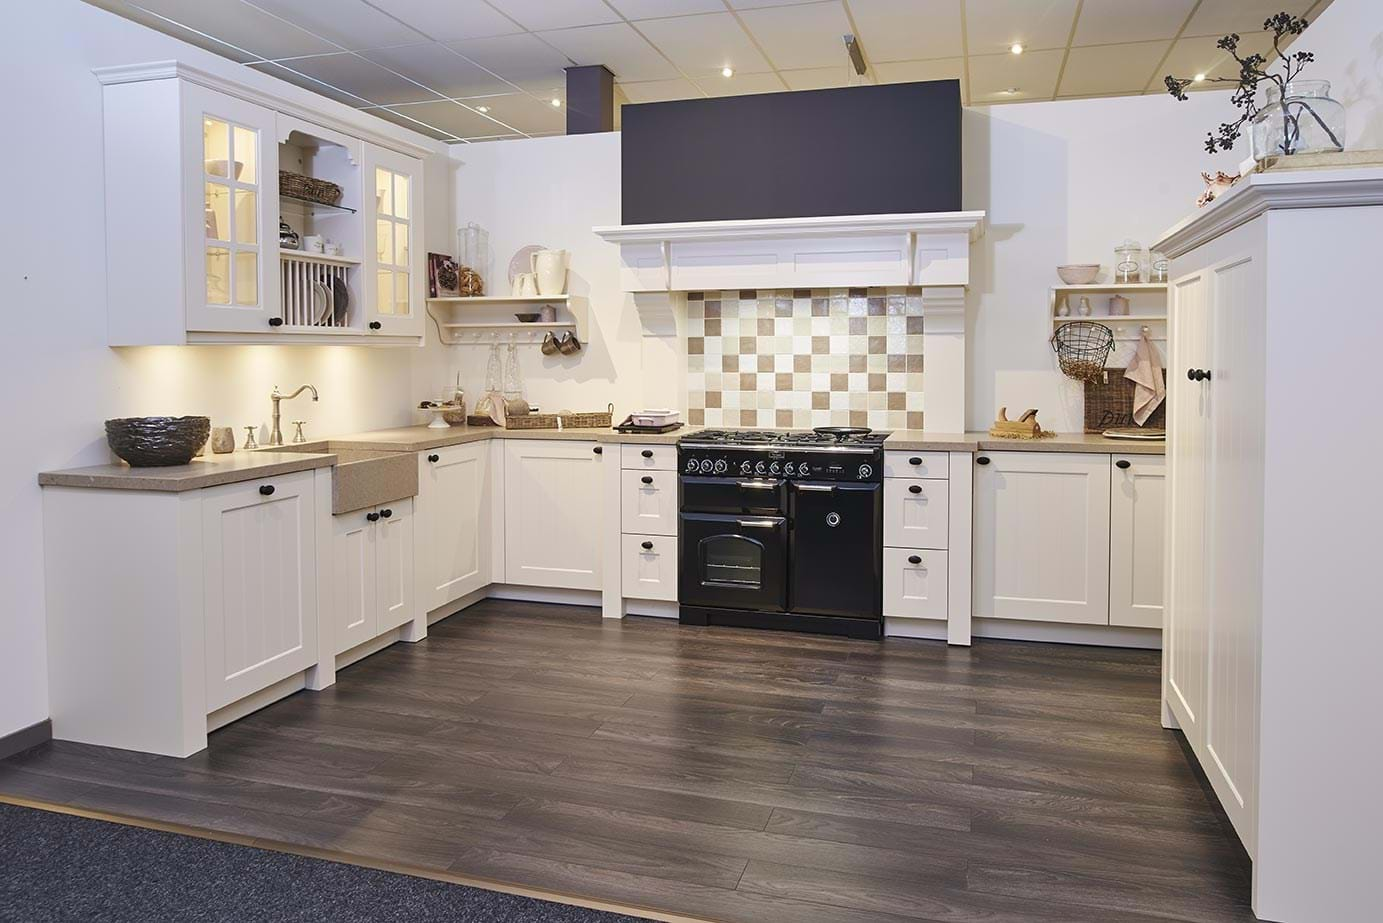 vithelp | kleine keuken huren, Deco ideeën